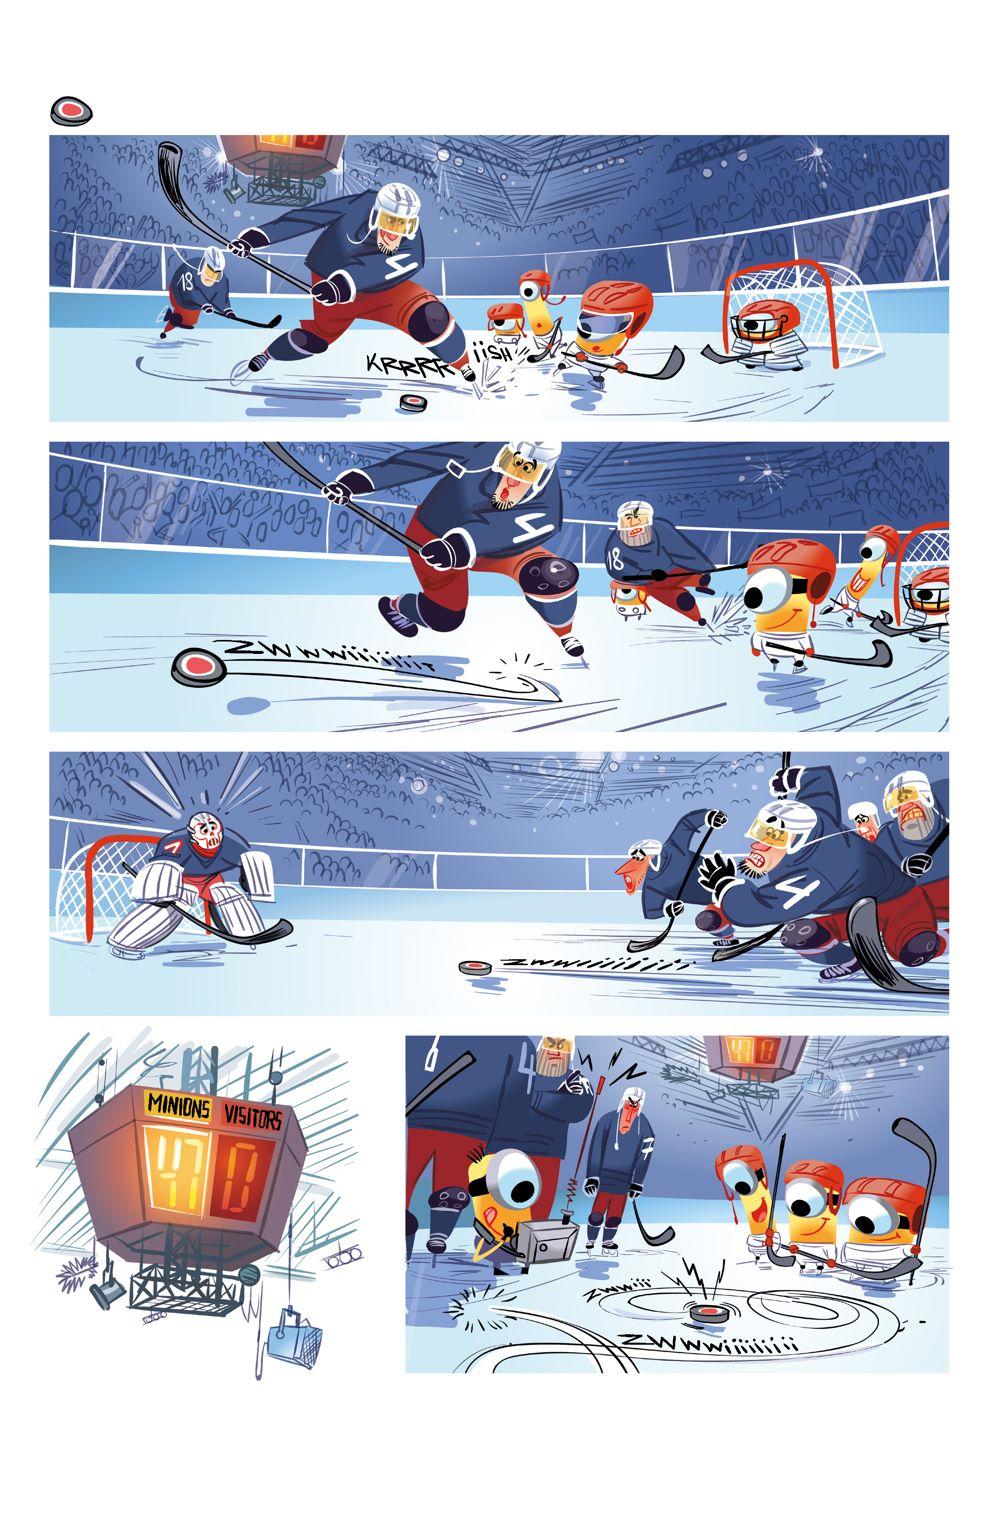 Interiors-Minions-Sports-1-Full-PDF-2_Page_2 ComicList Previews: MINIONS VOLUME 5 SPORTS #1